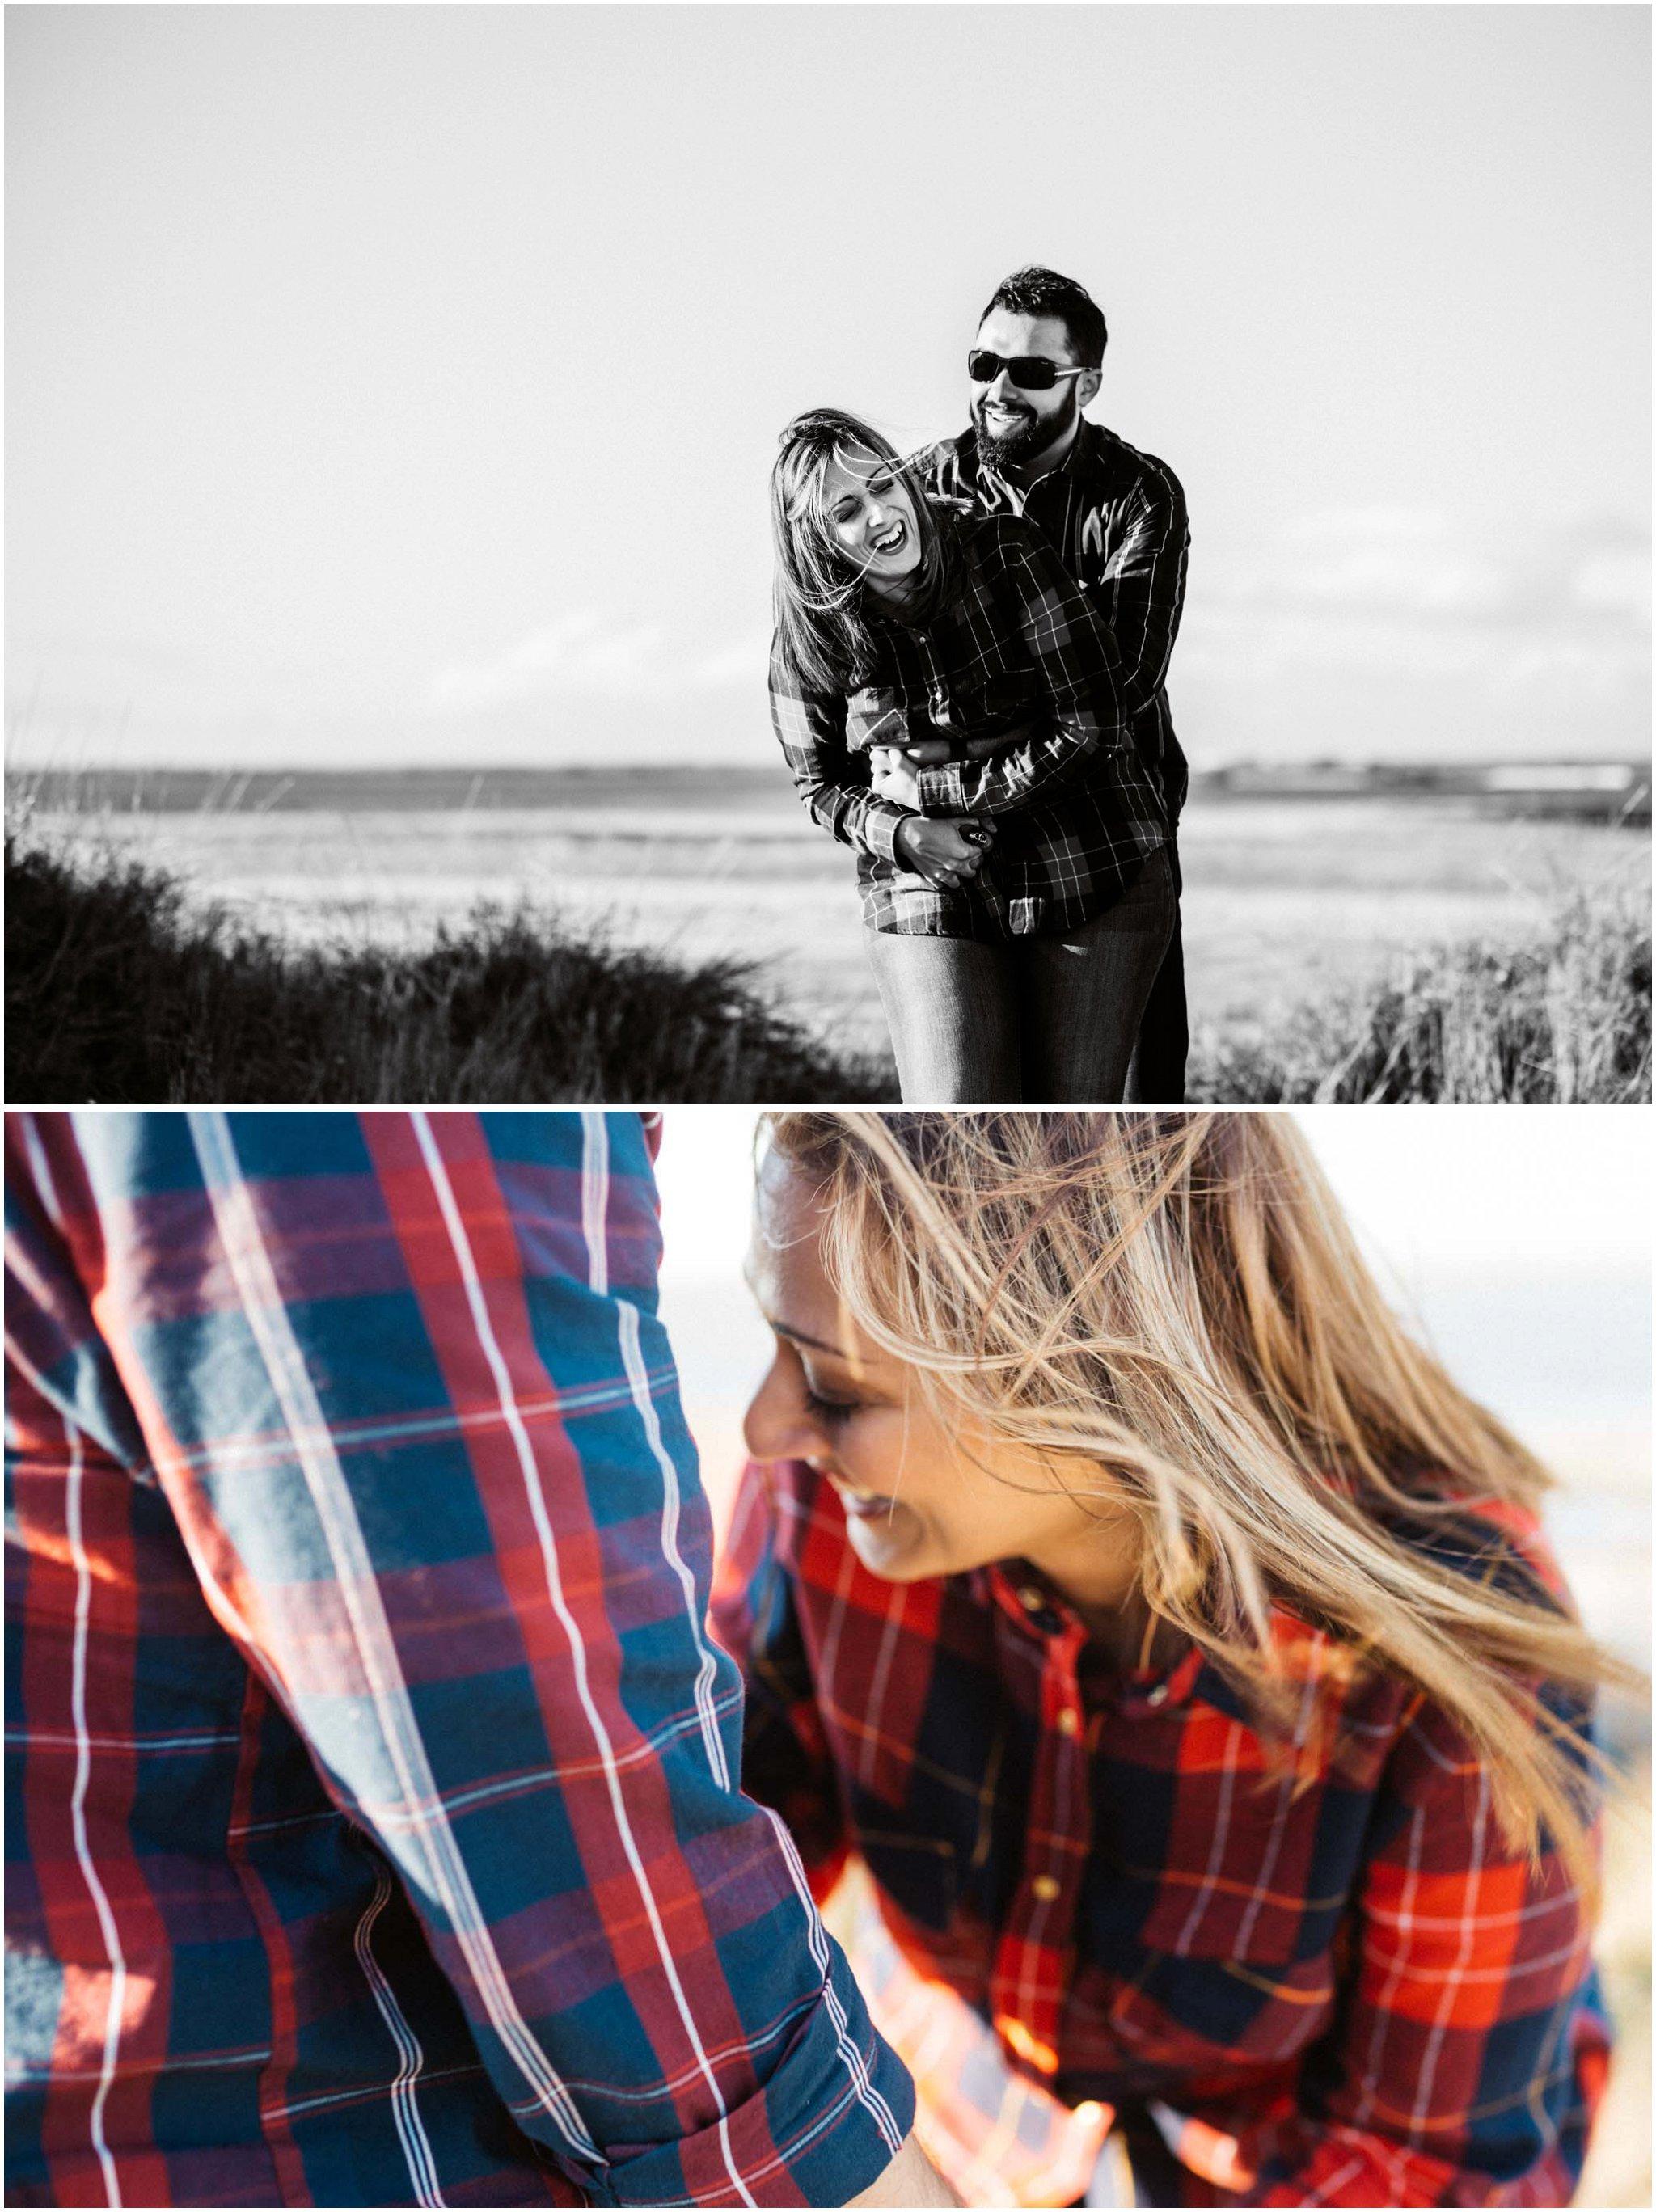 jeremy-guillaume-05-couple-photo-intime-emotion